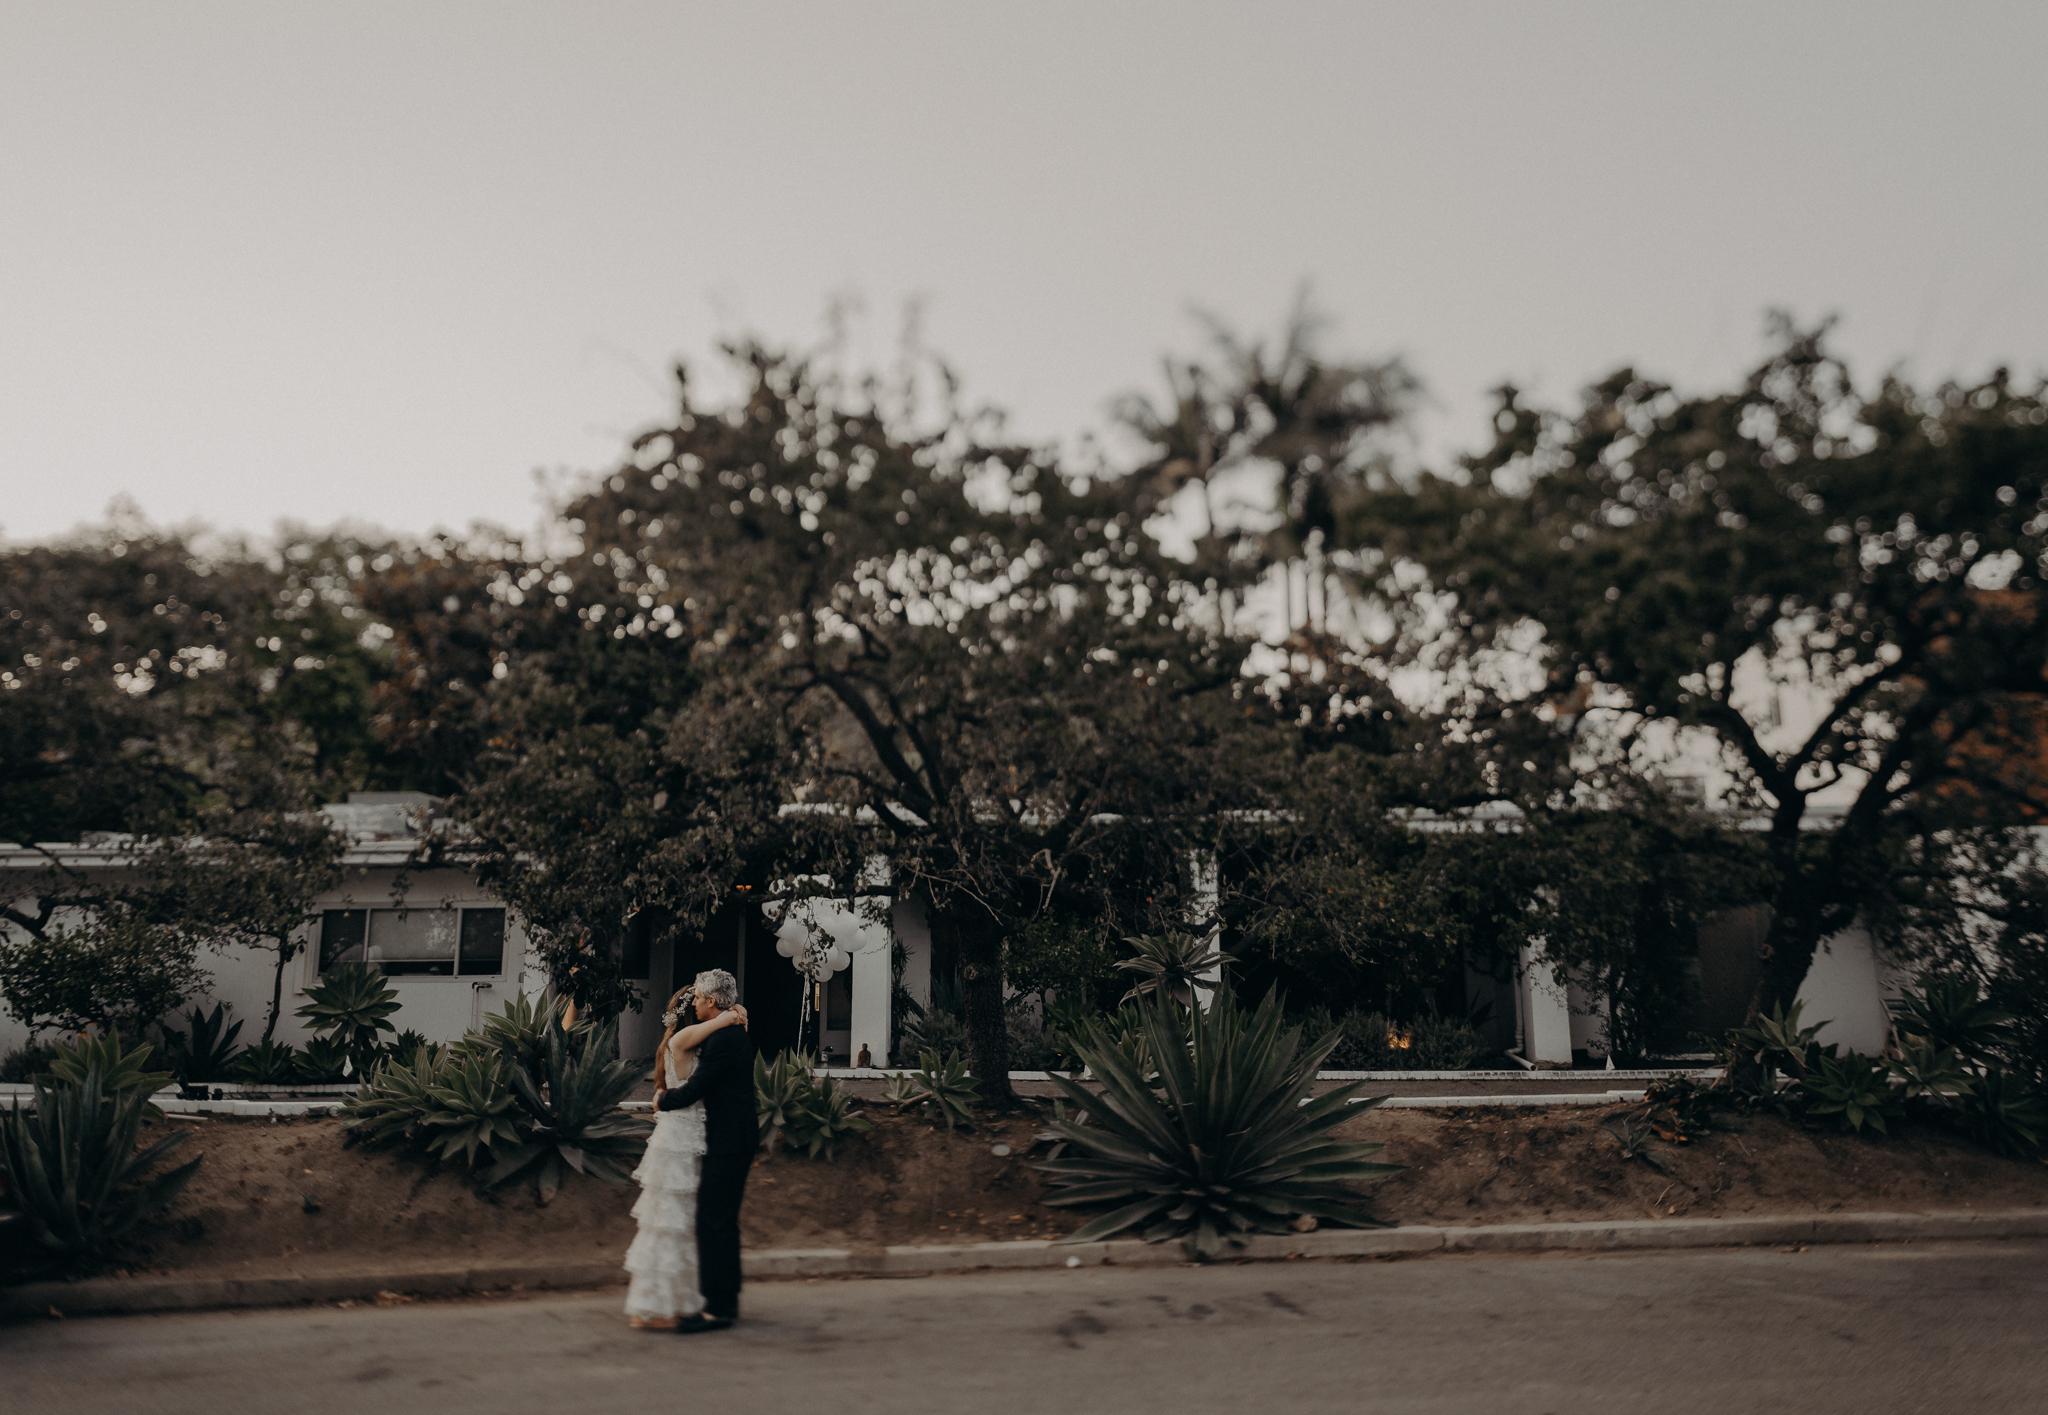 Isaiah + Taylor Photography - Private Estate Backyard Wedding - Beverly Hills - Los Angeles Wedding Photographer - 109.jpg